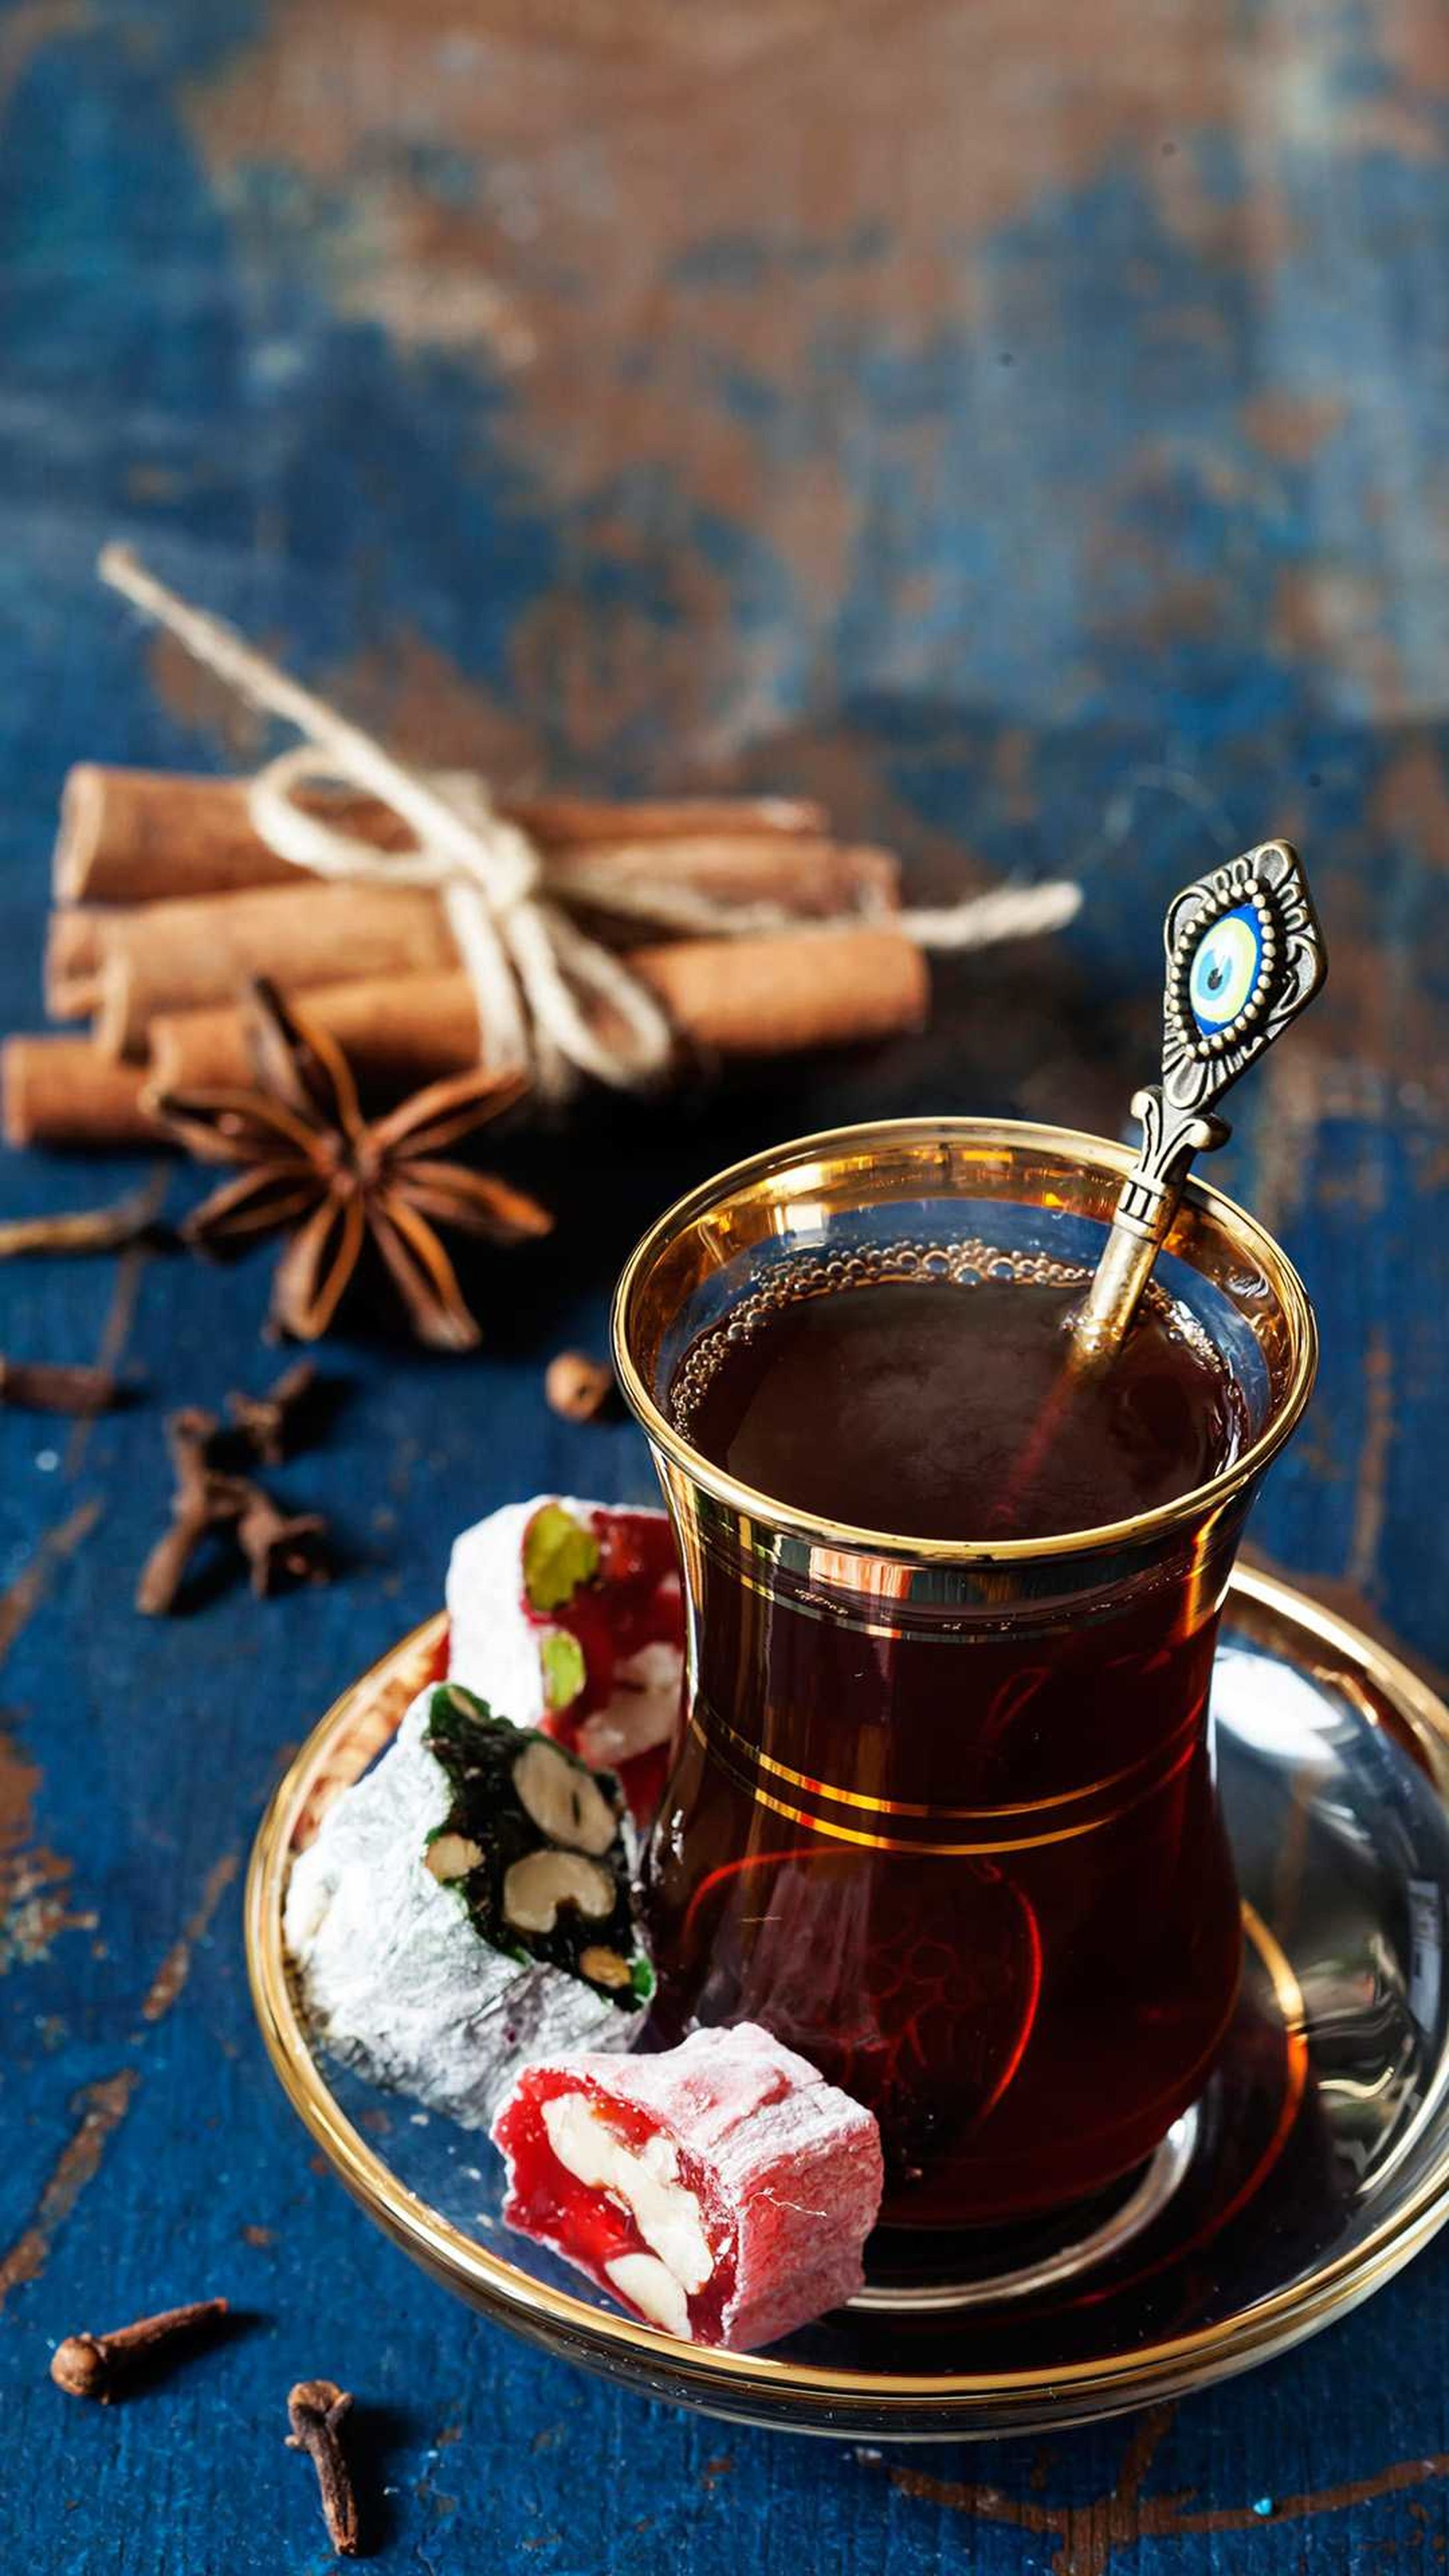 star anise, sweet food, drink, cinnamon, food, tea - hot drink, no people, indoors, close-up